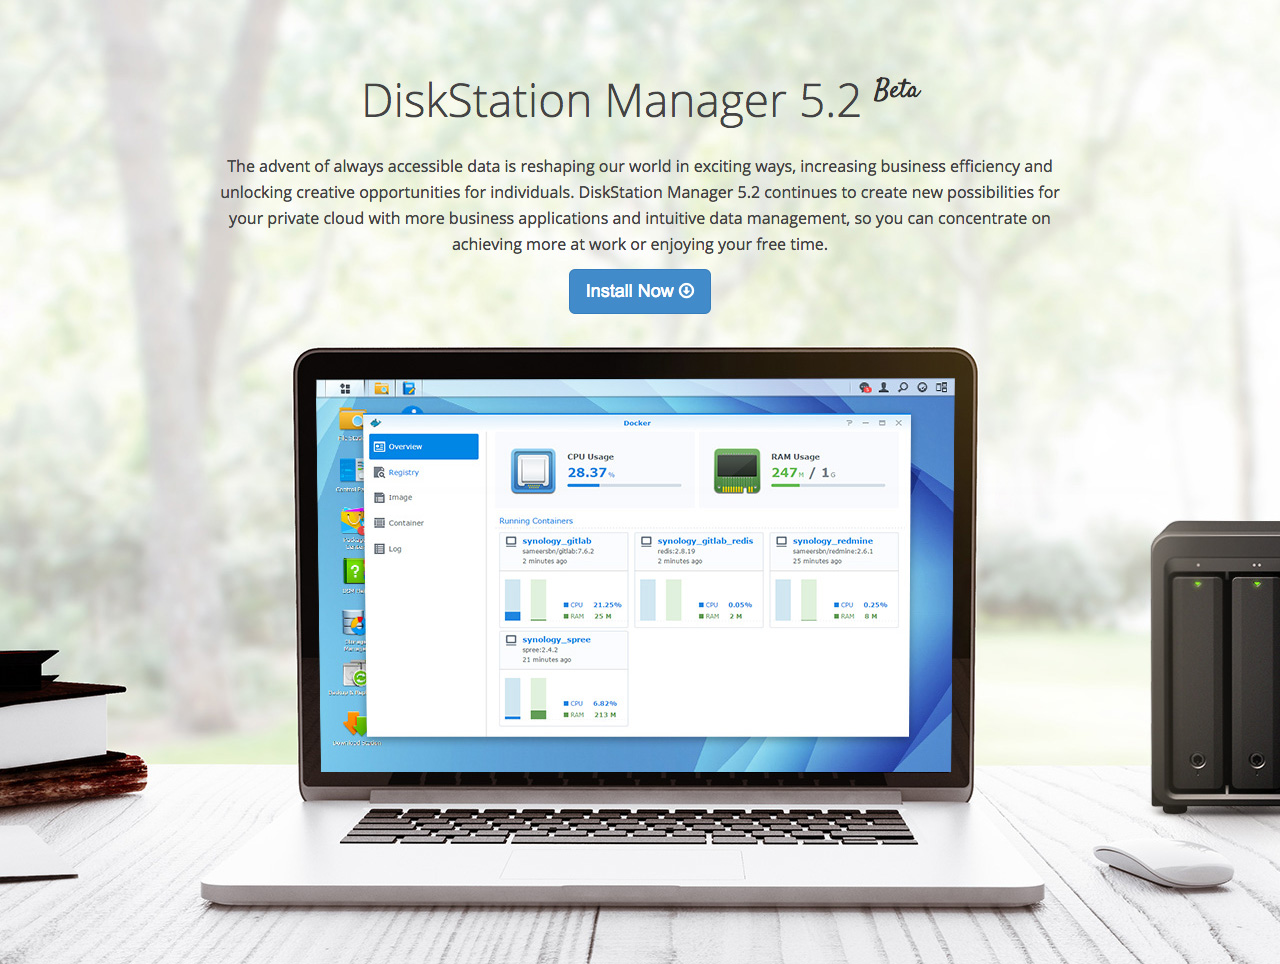 DSM 5.2 Beta